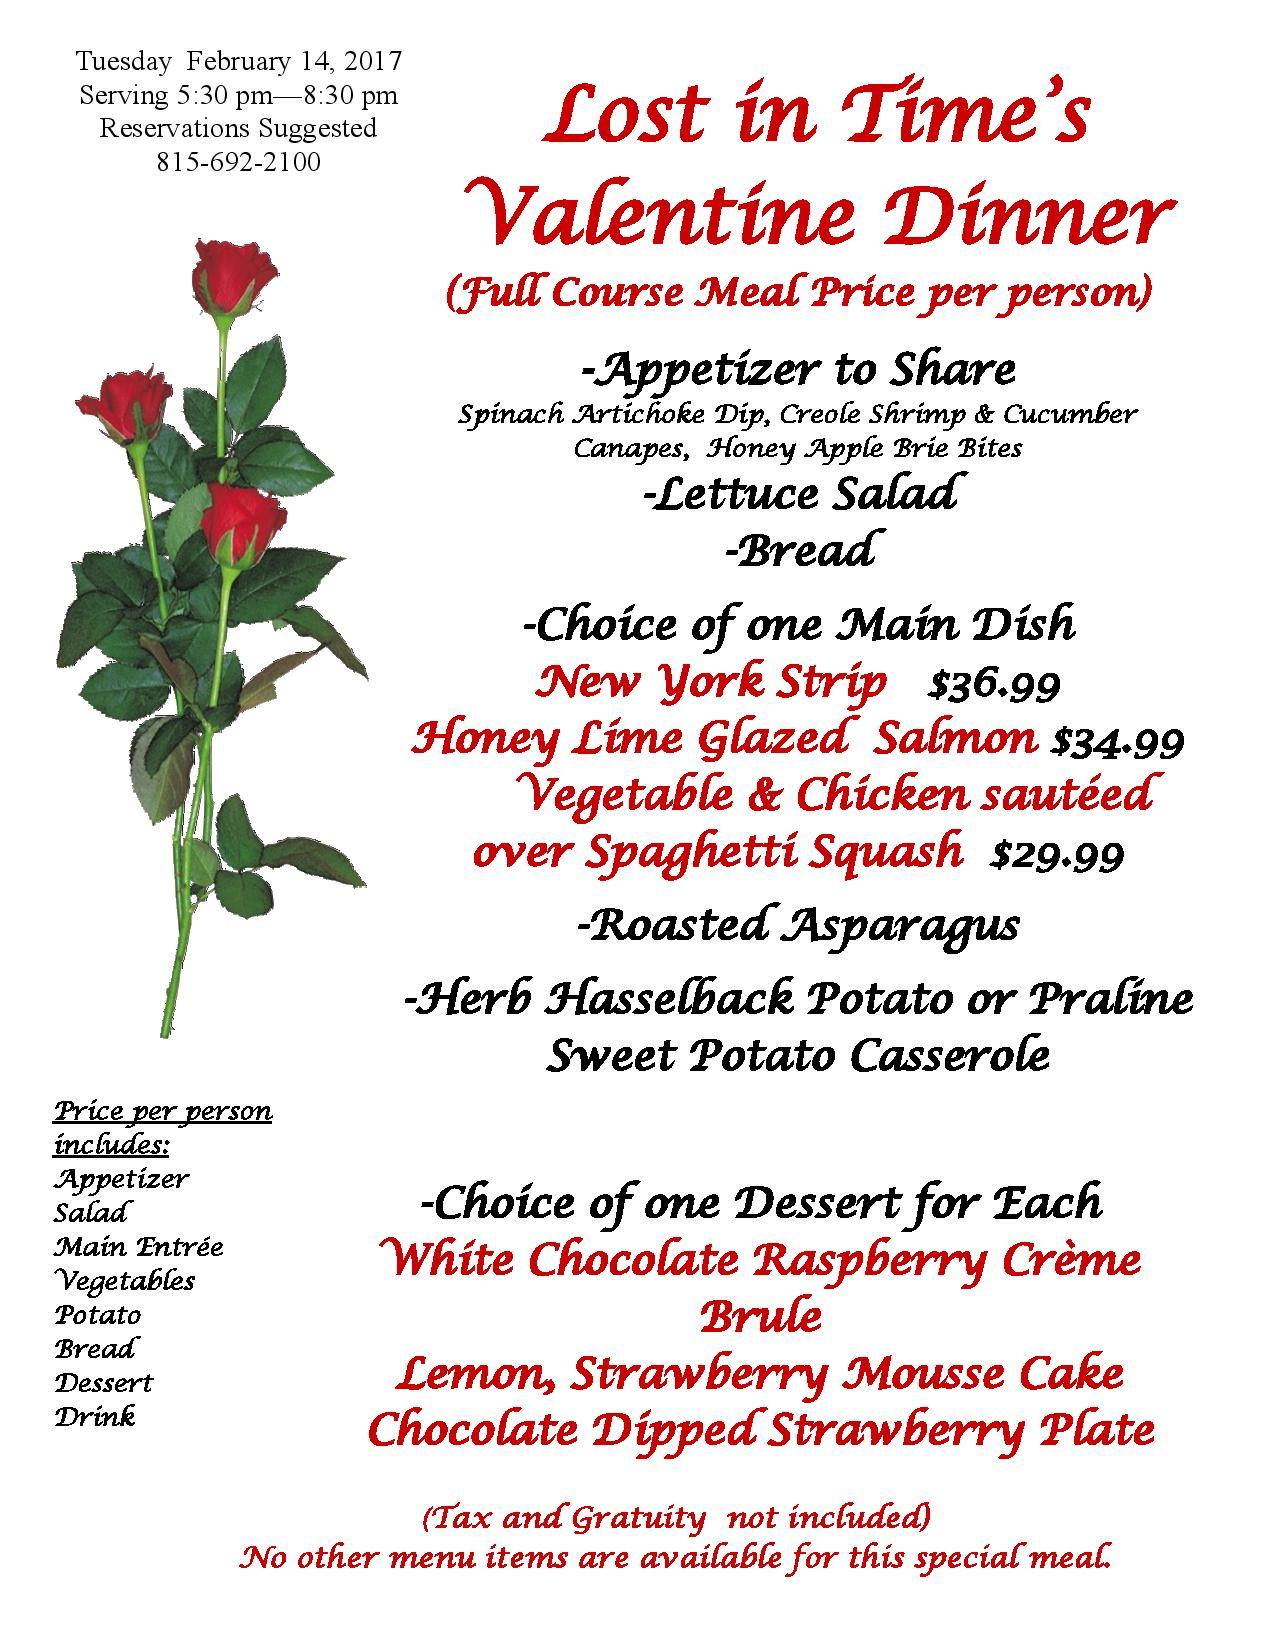 214 Valentine Dinner Fairbury Illinois Attractions